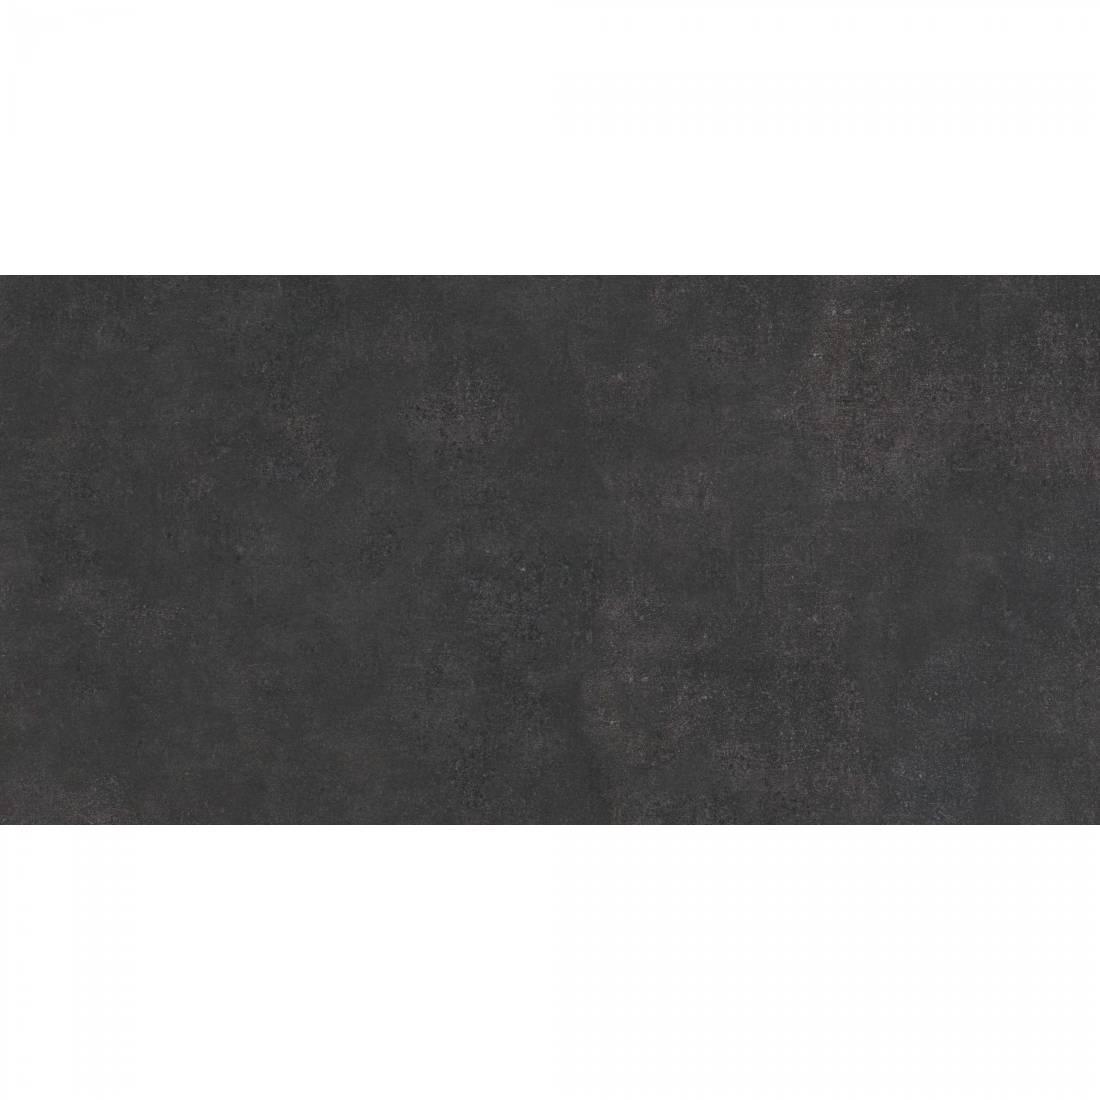 Metropoli 40x80 Negro 1